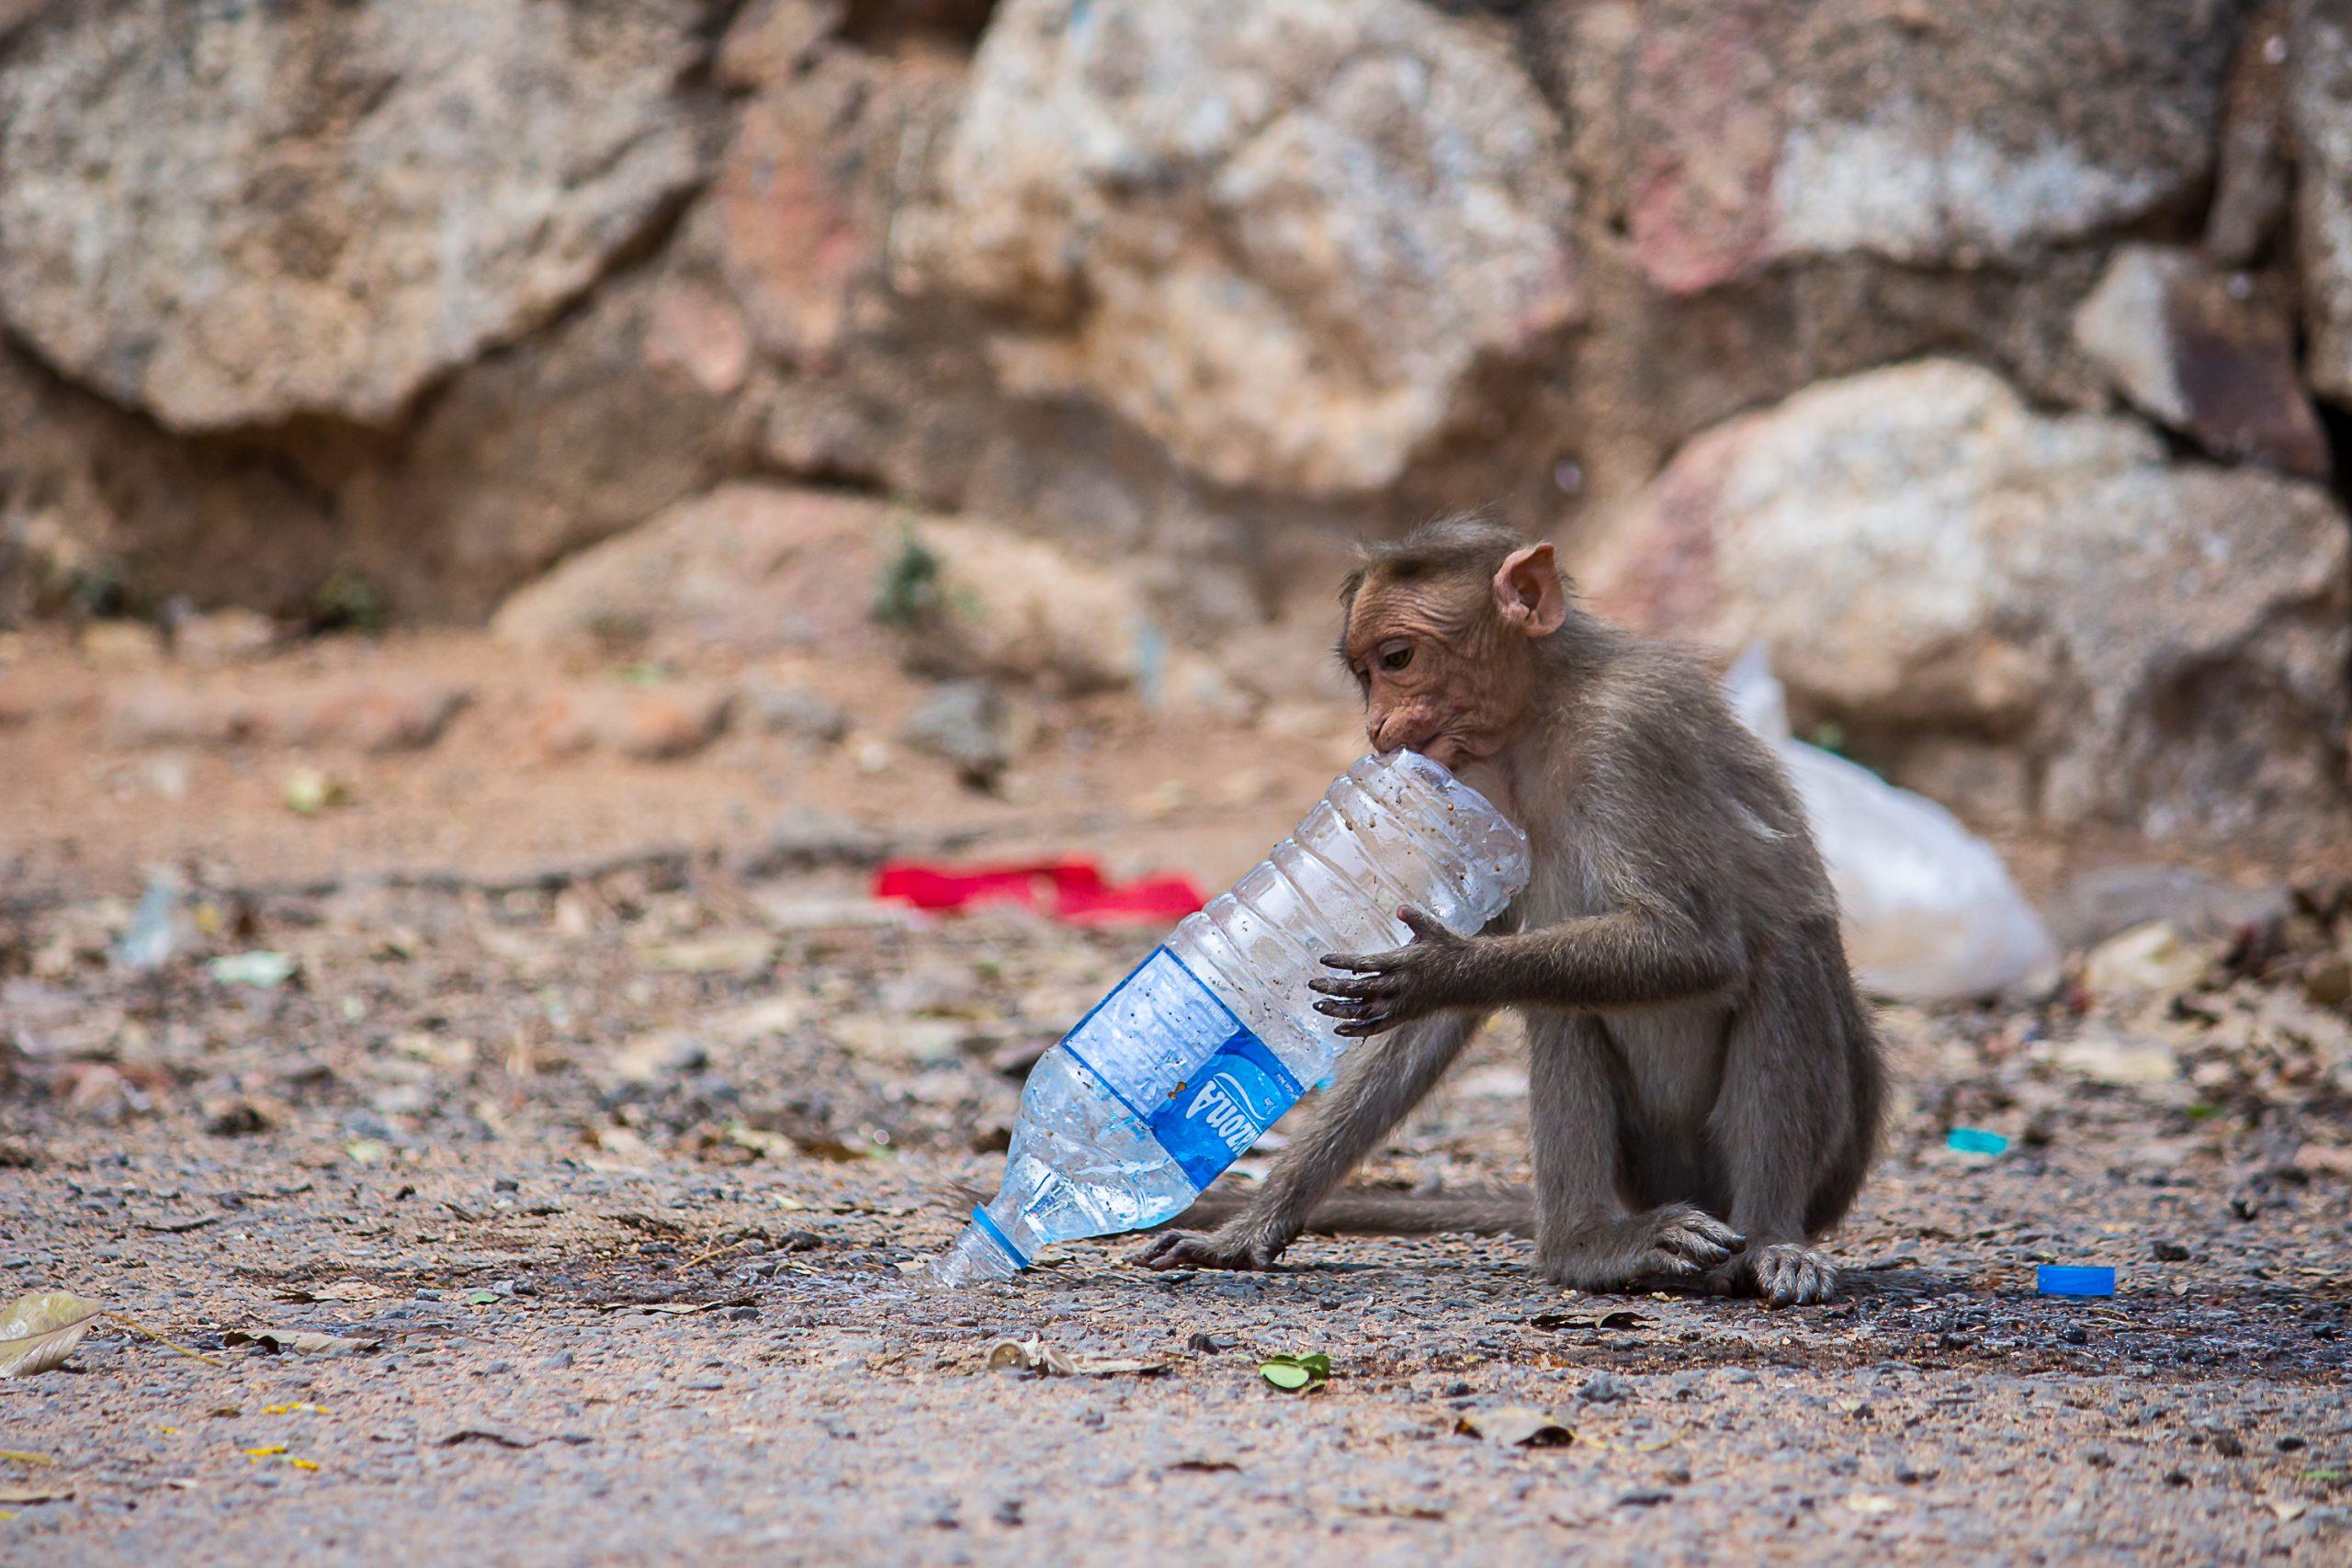 A monkey biting a plastic bottle